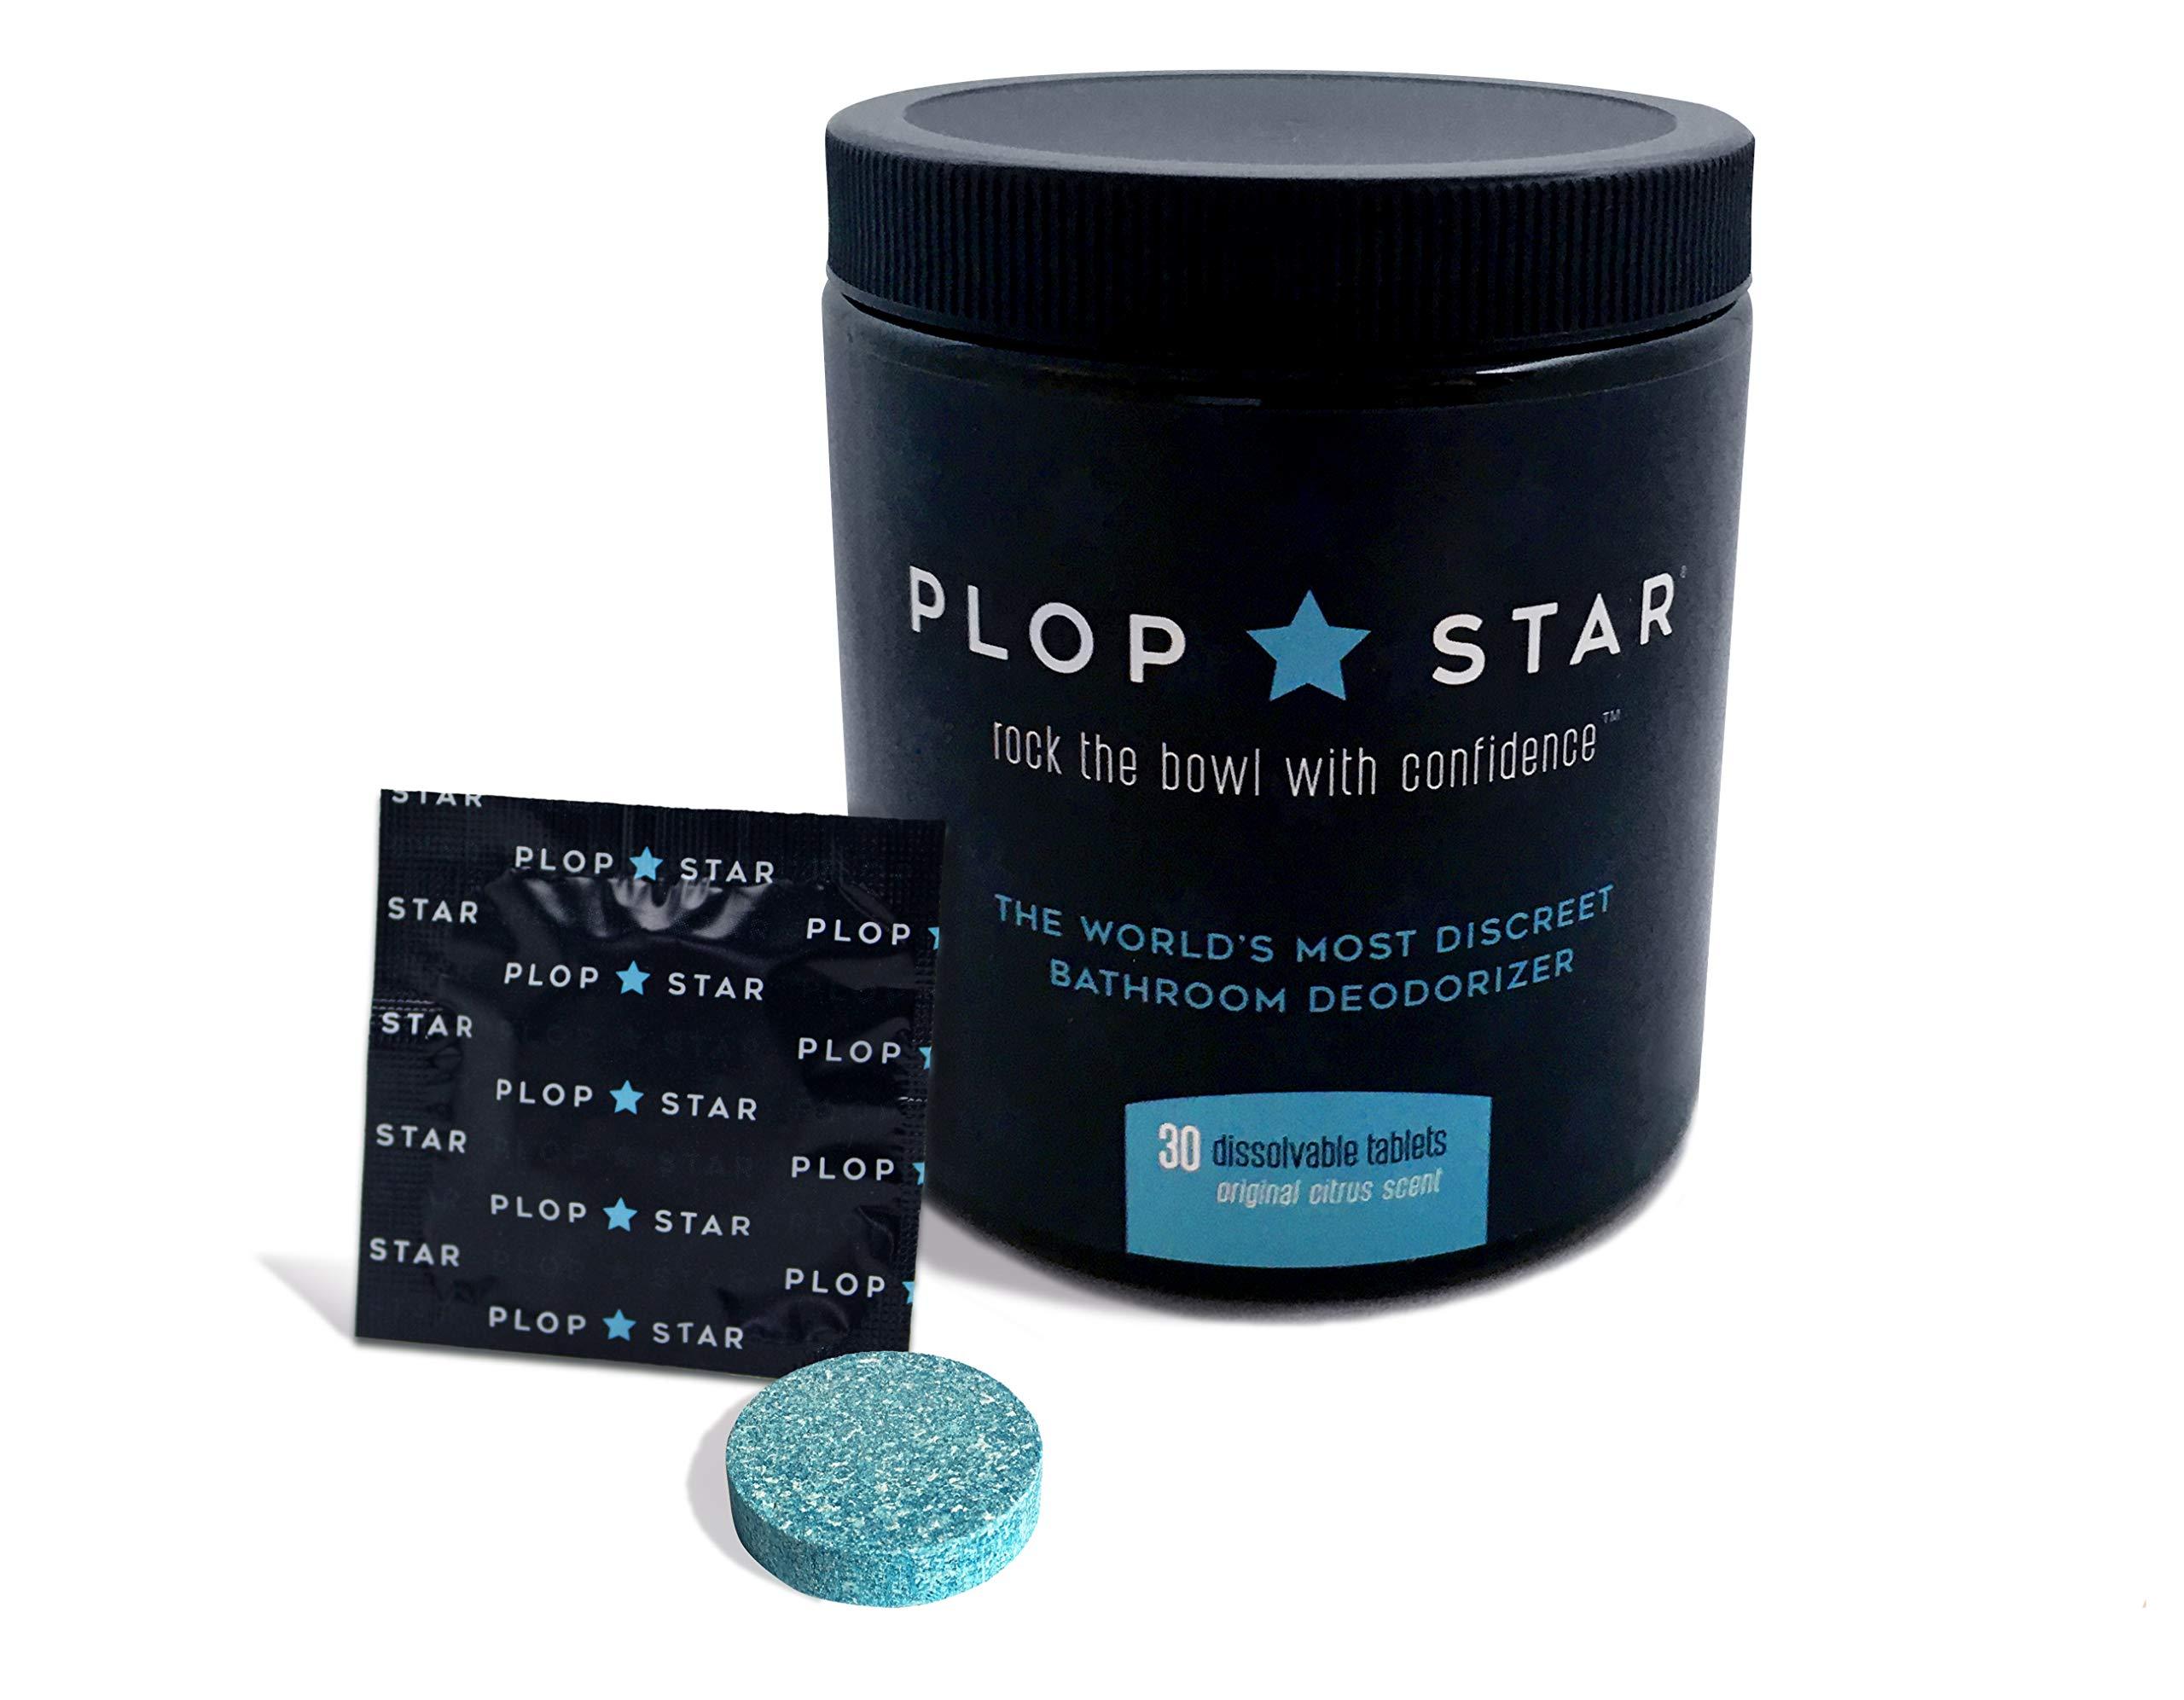 Plop Star   As Seen On Shark Tank   World's Most Discreet Bathroom Deodorizer   Odor Eliminating Toilet Tablets   30 Pack Tub